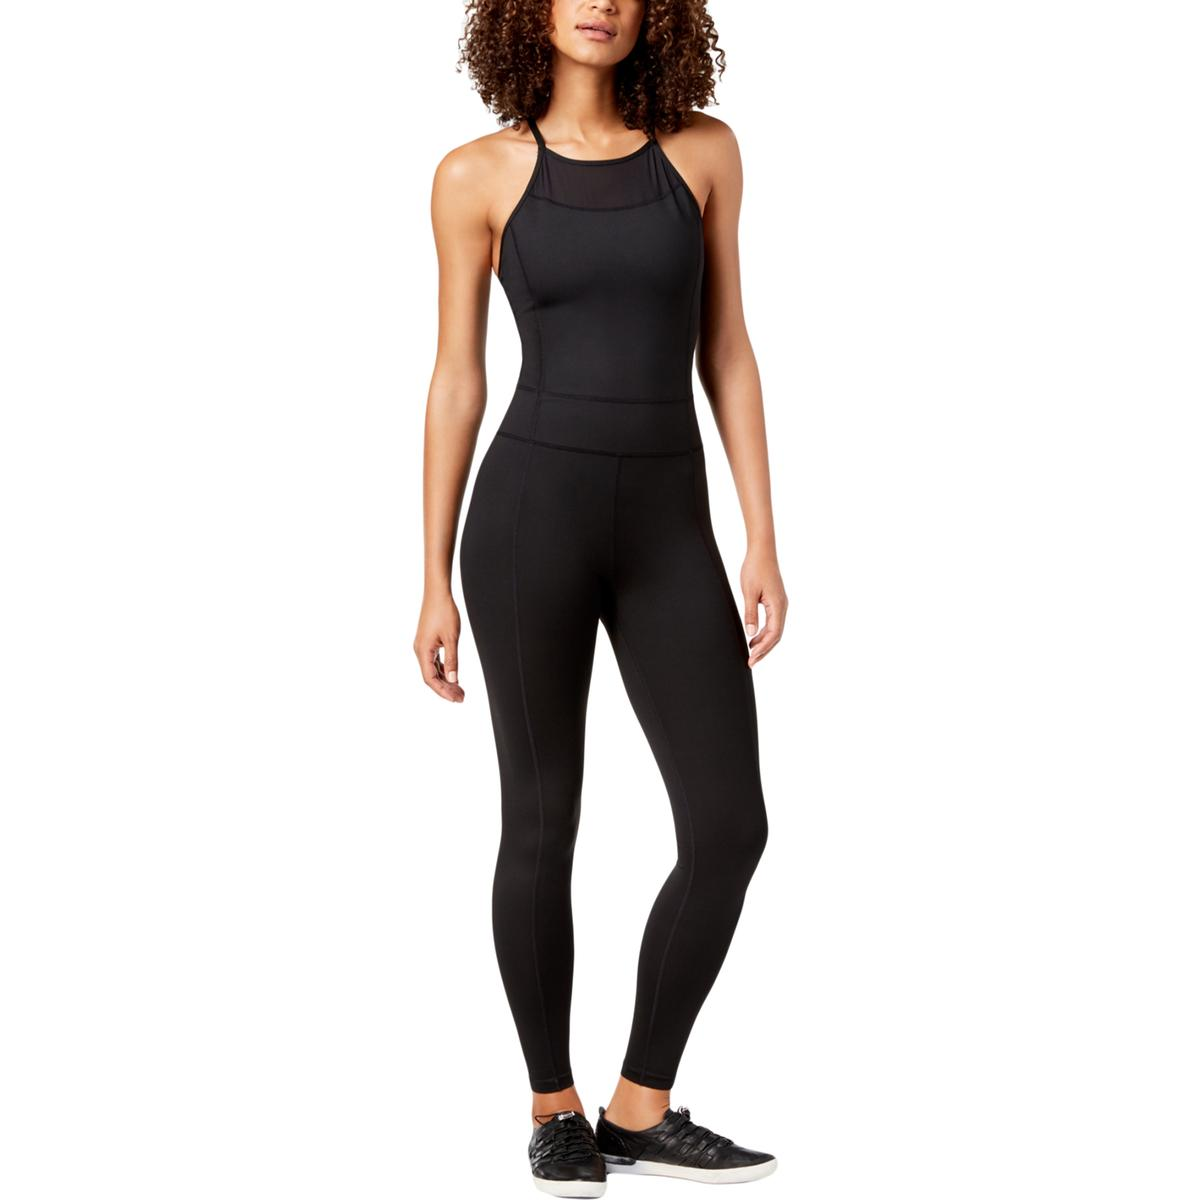 5f6f700341d0 Calvin Klein Performance Womens Black Fitness Jumpsuit Athletic M ...